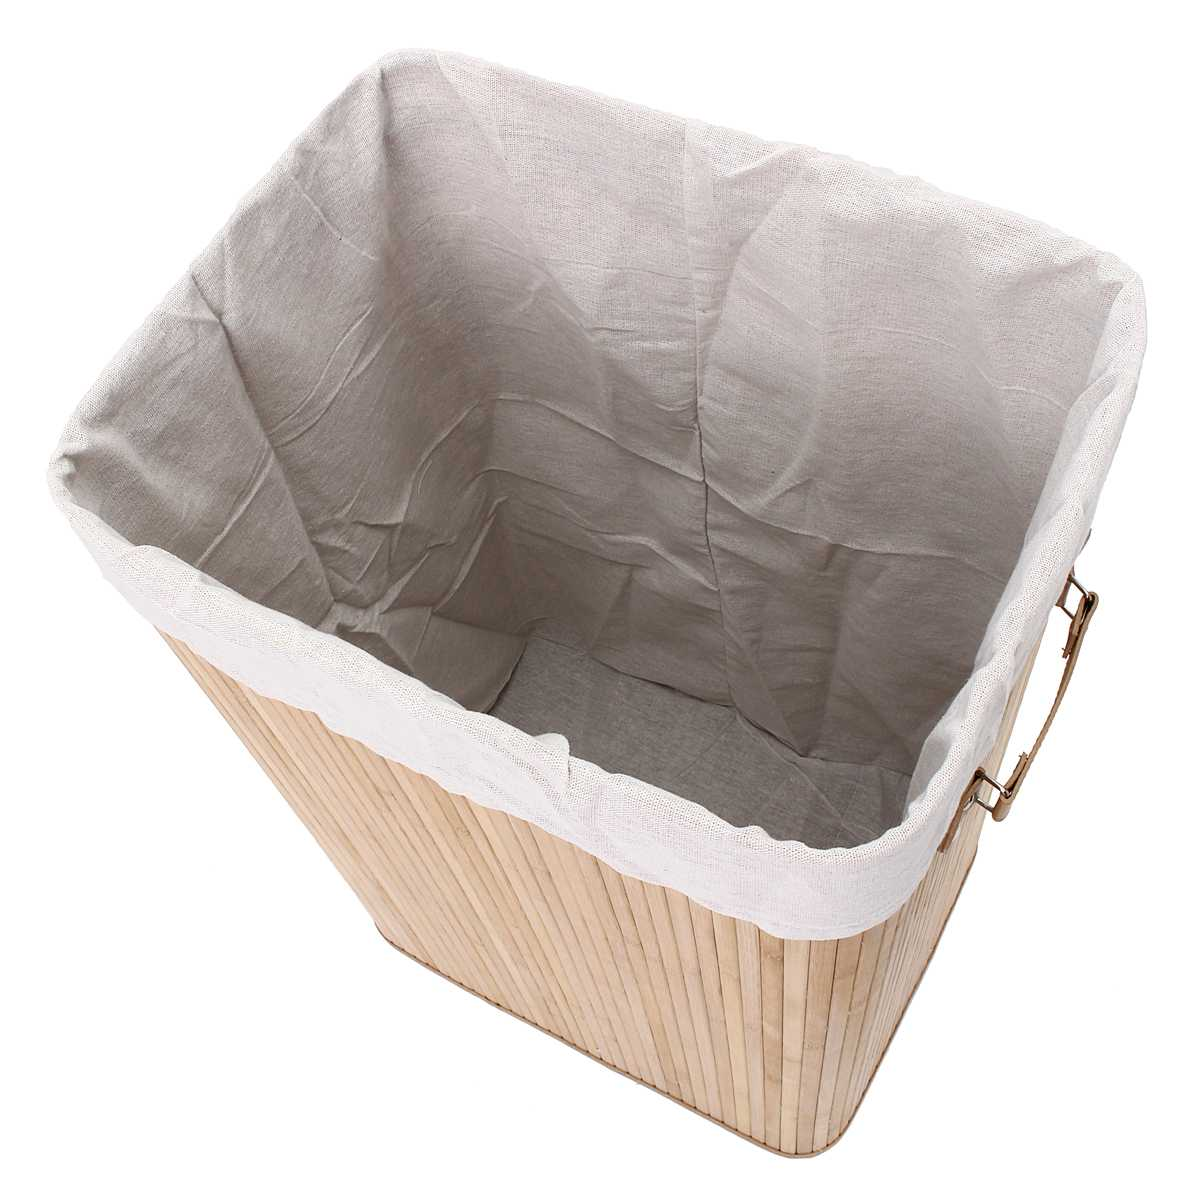 Bamboo Laundry Hamper Basket Dirty Clothes Storage Sorter Organizer Bin Lid US